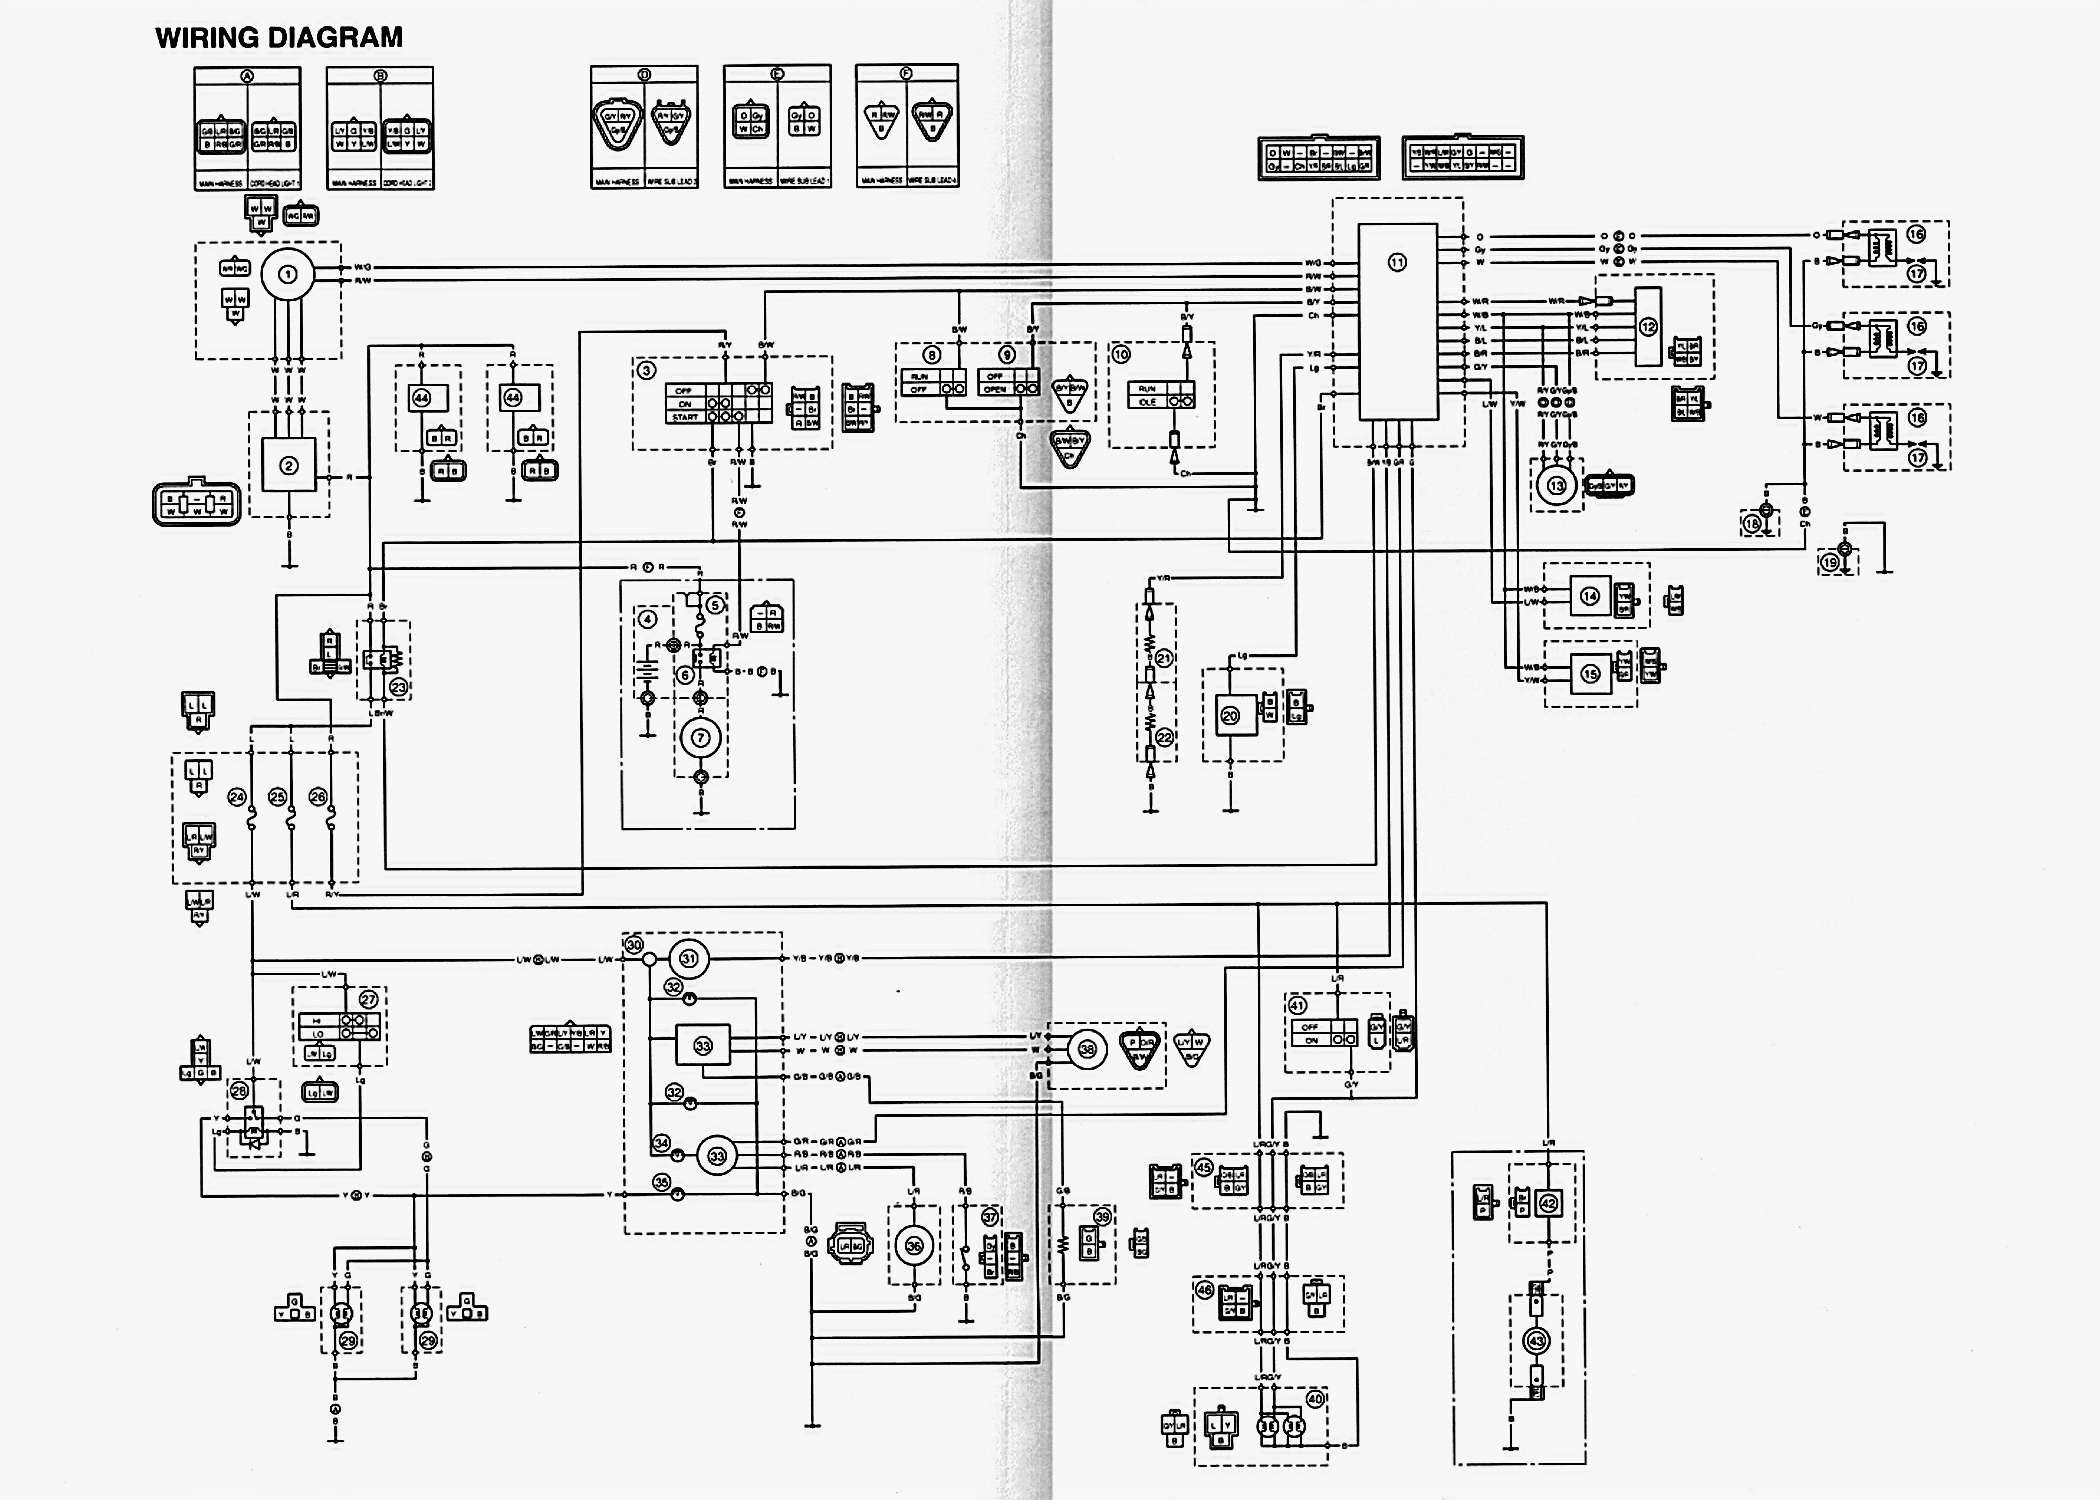 yamaha qt50 wiring diagram auto meter tach gauge snowmobile bb purebuild co best library rh 57 princestaash org